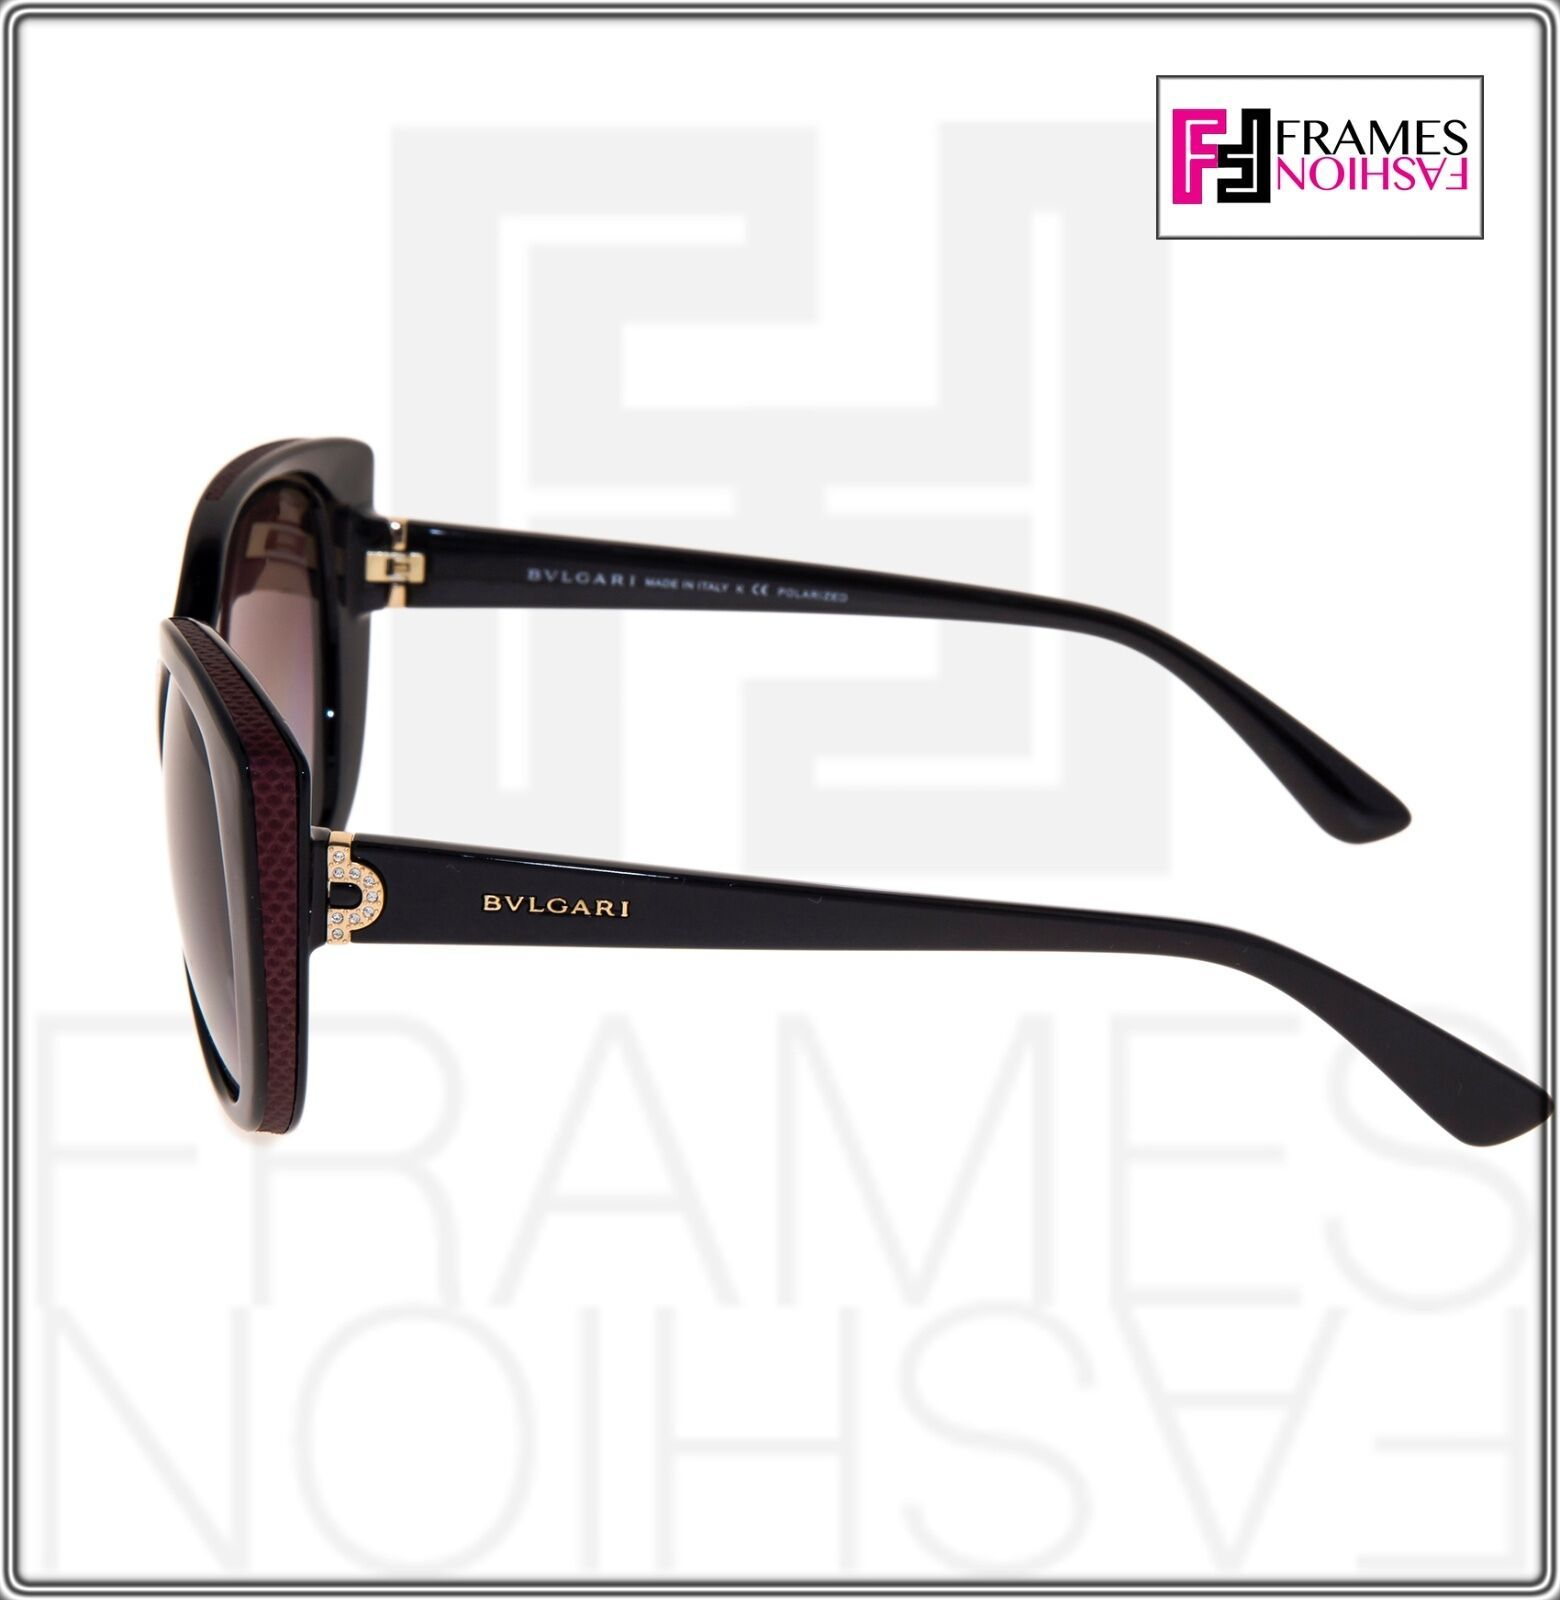 BVLGARI LOGO BV8157BQ Black Burgundy Leather Violet POLARIZED Sunglasses 8157 image 2